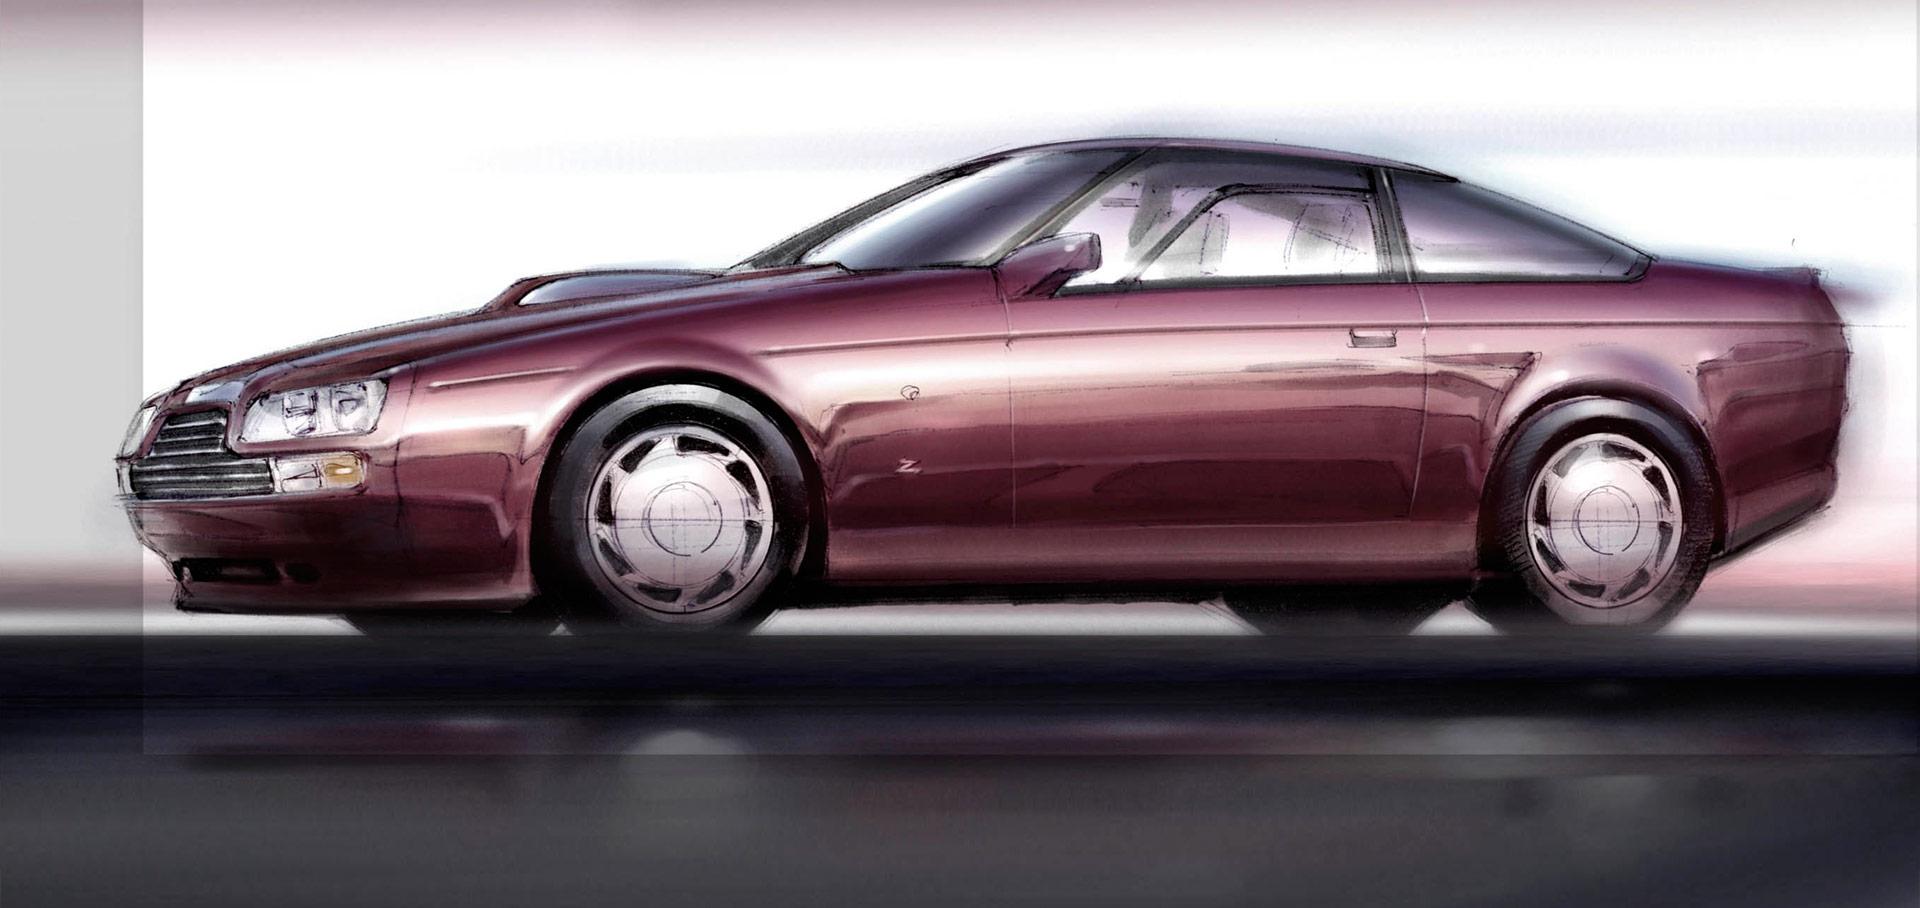 1986 Aston Martin V8 Vantage Zagato Design Sketch Car Body Design